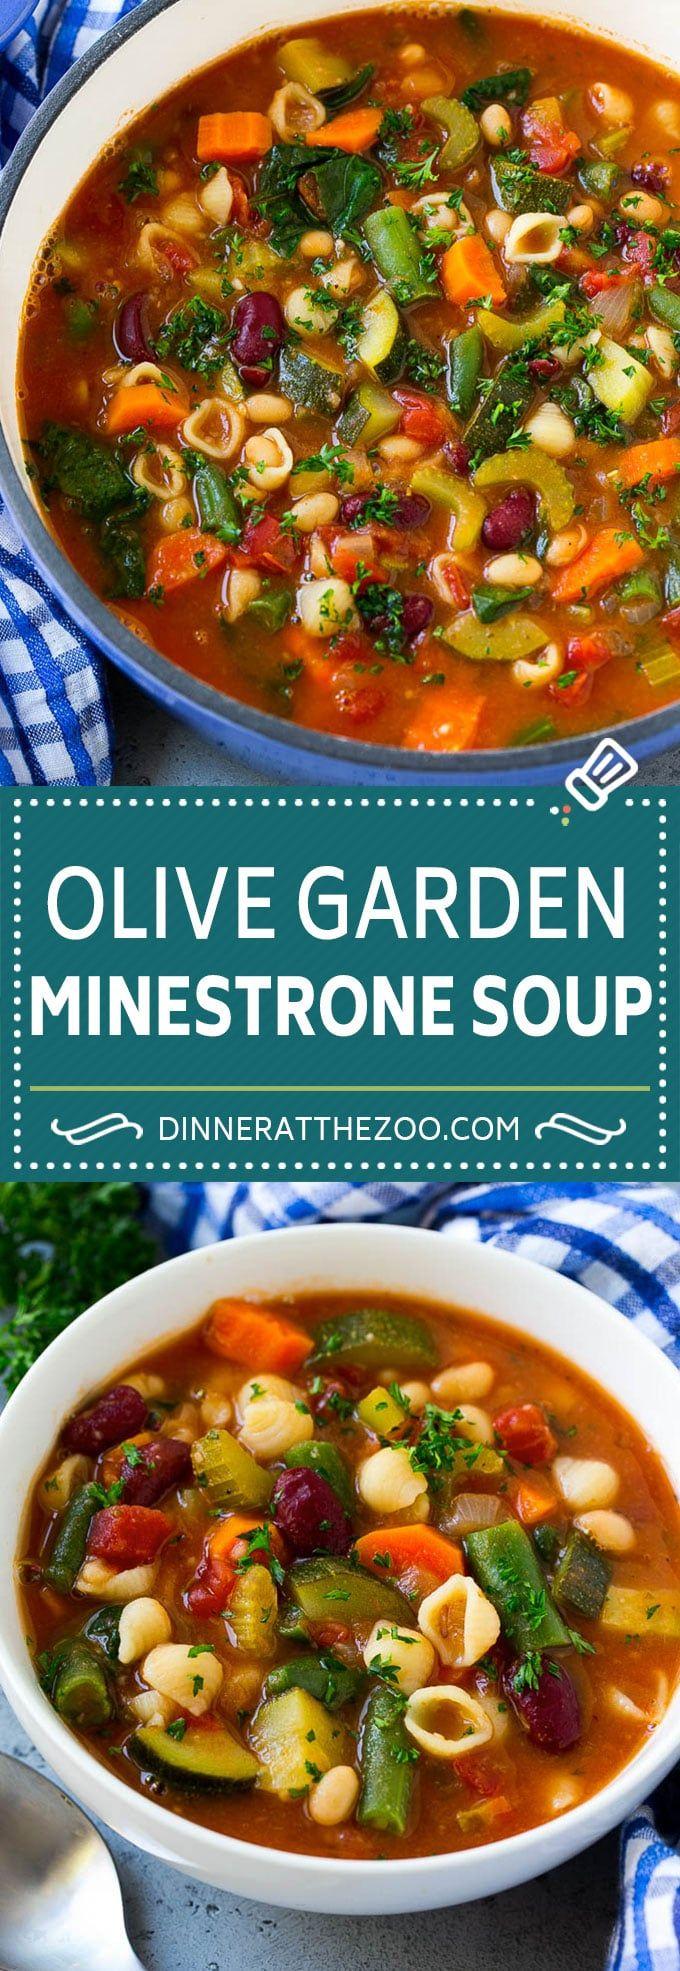 Olive Garden Minestrone Soup Recipe | Minestrone Soup | Copycat Recipe #minestro…